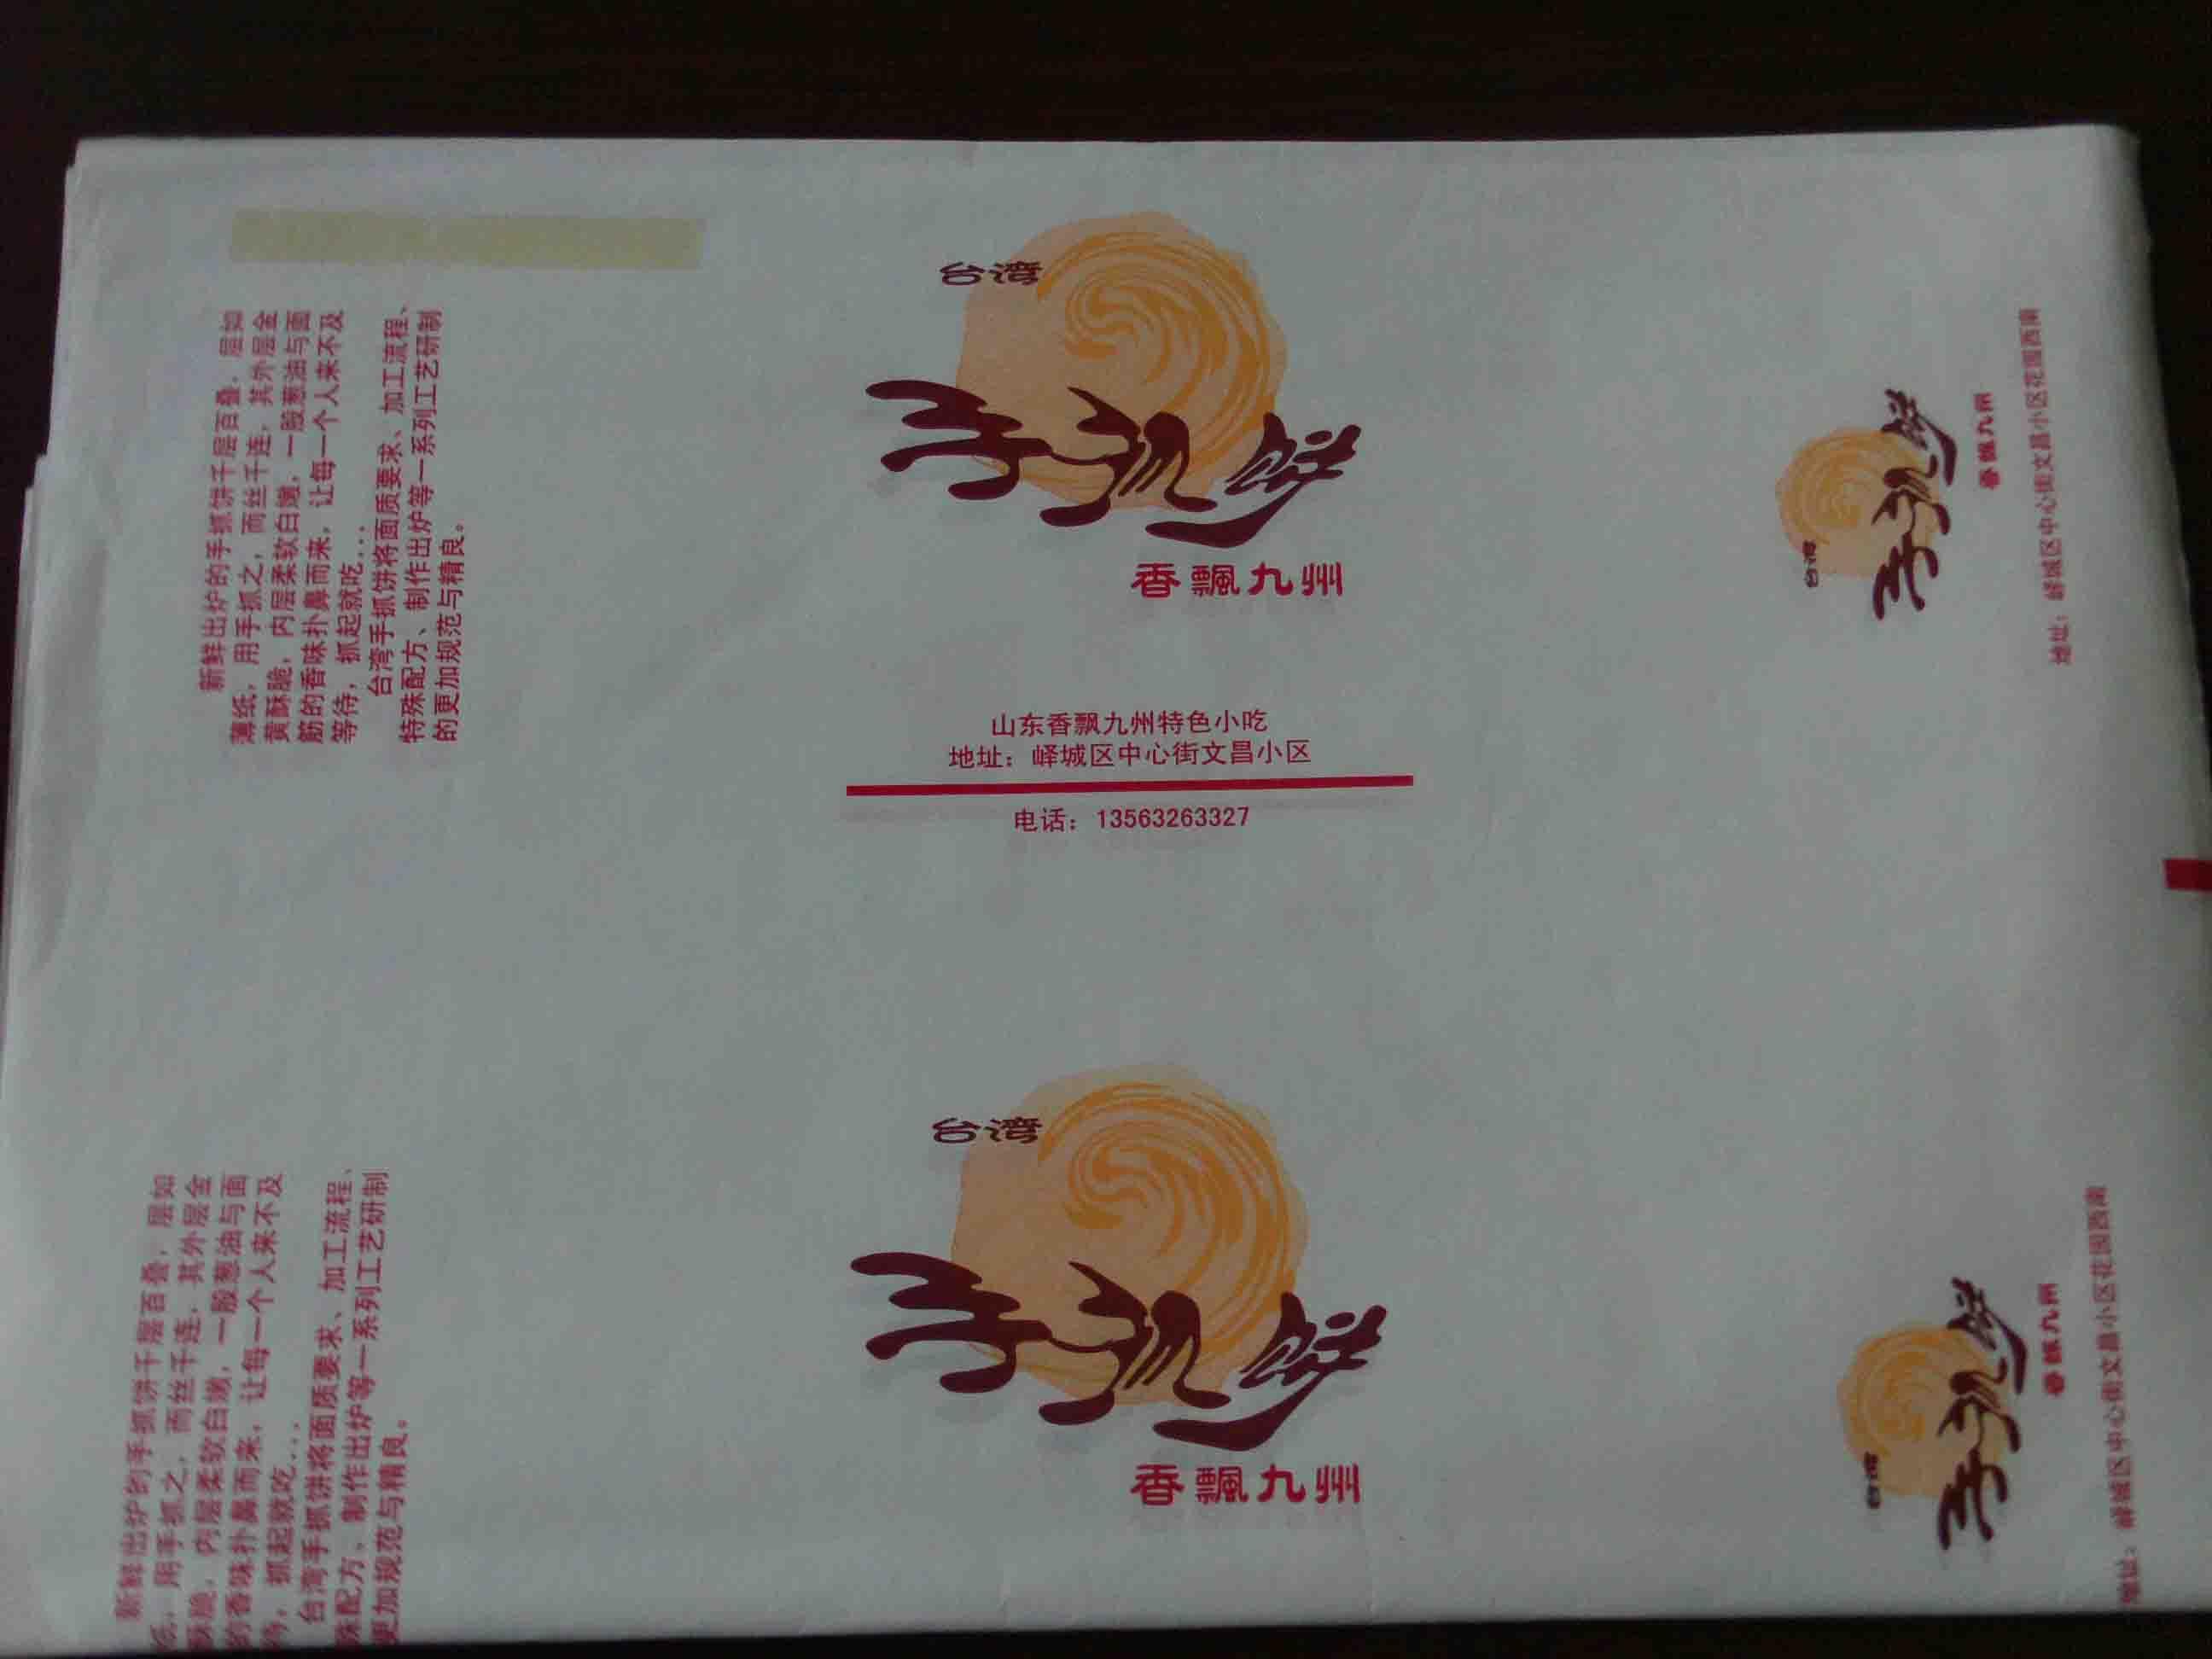 qs认证月饼包装纸产品图片高清大图